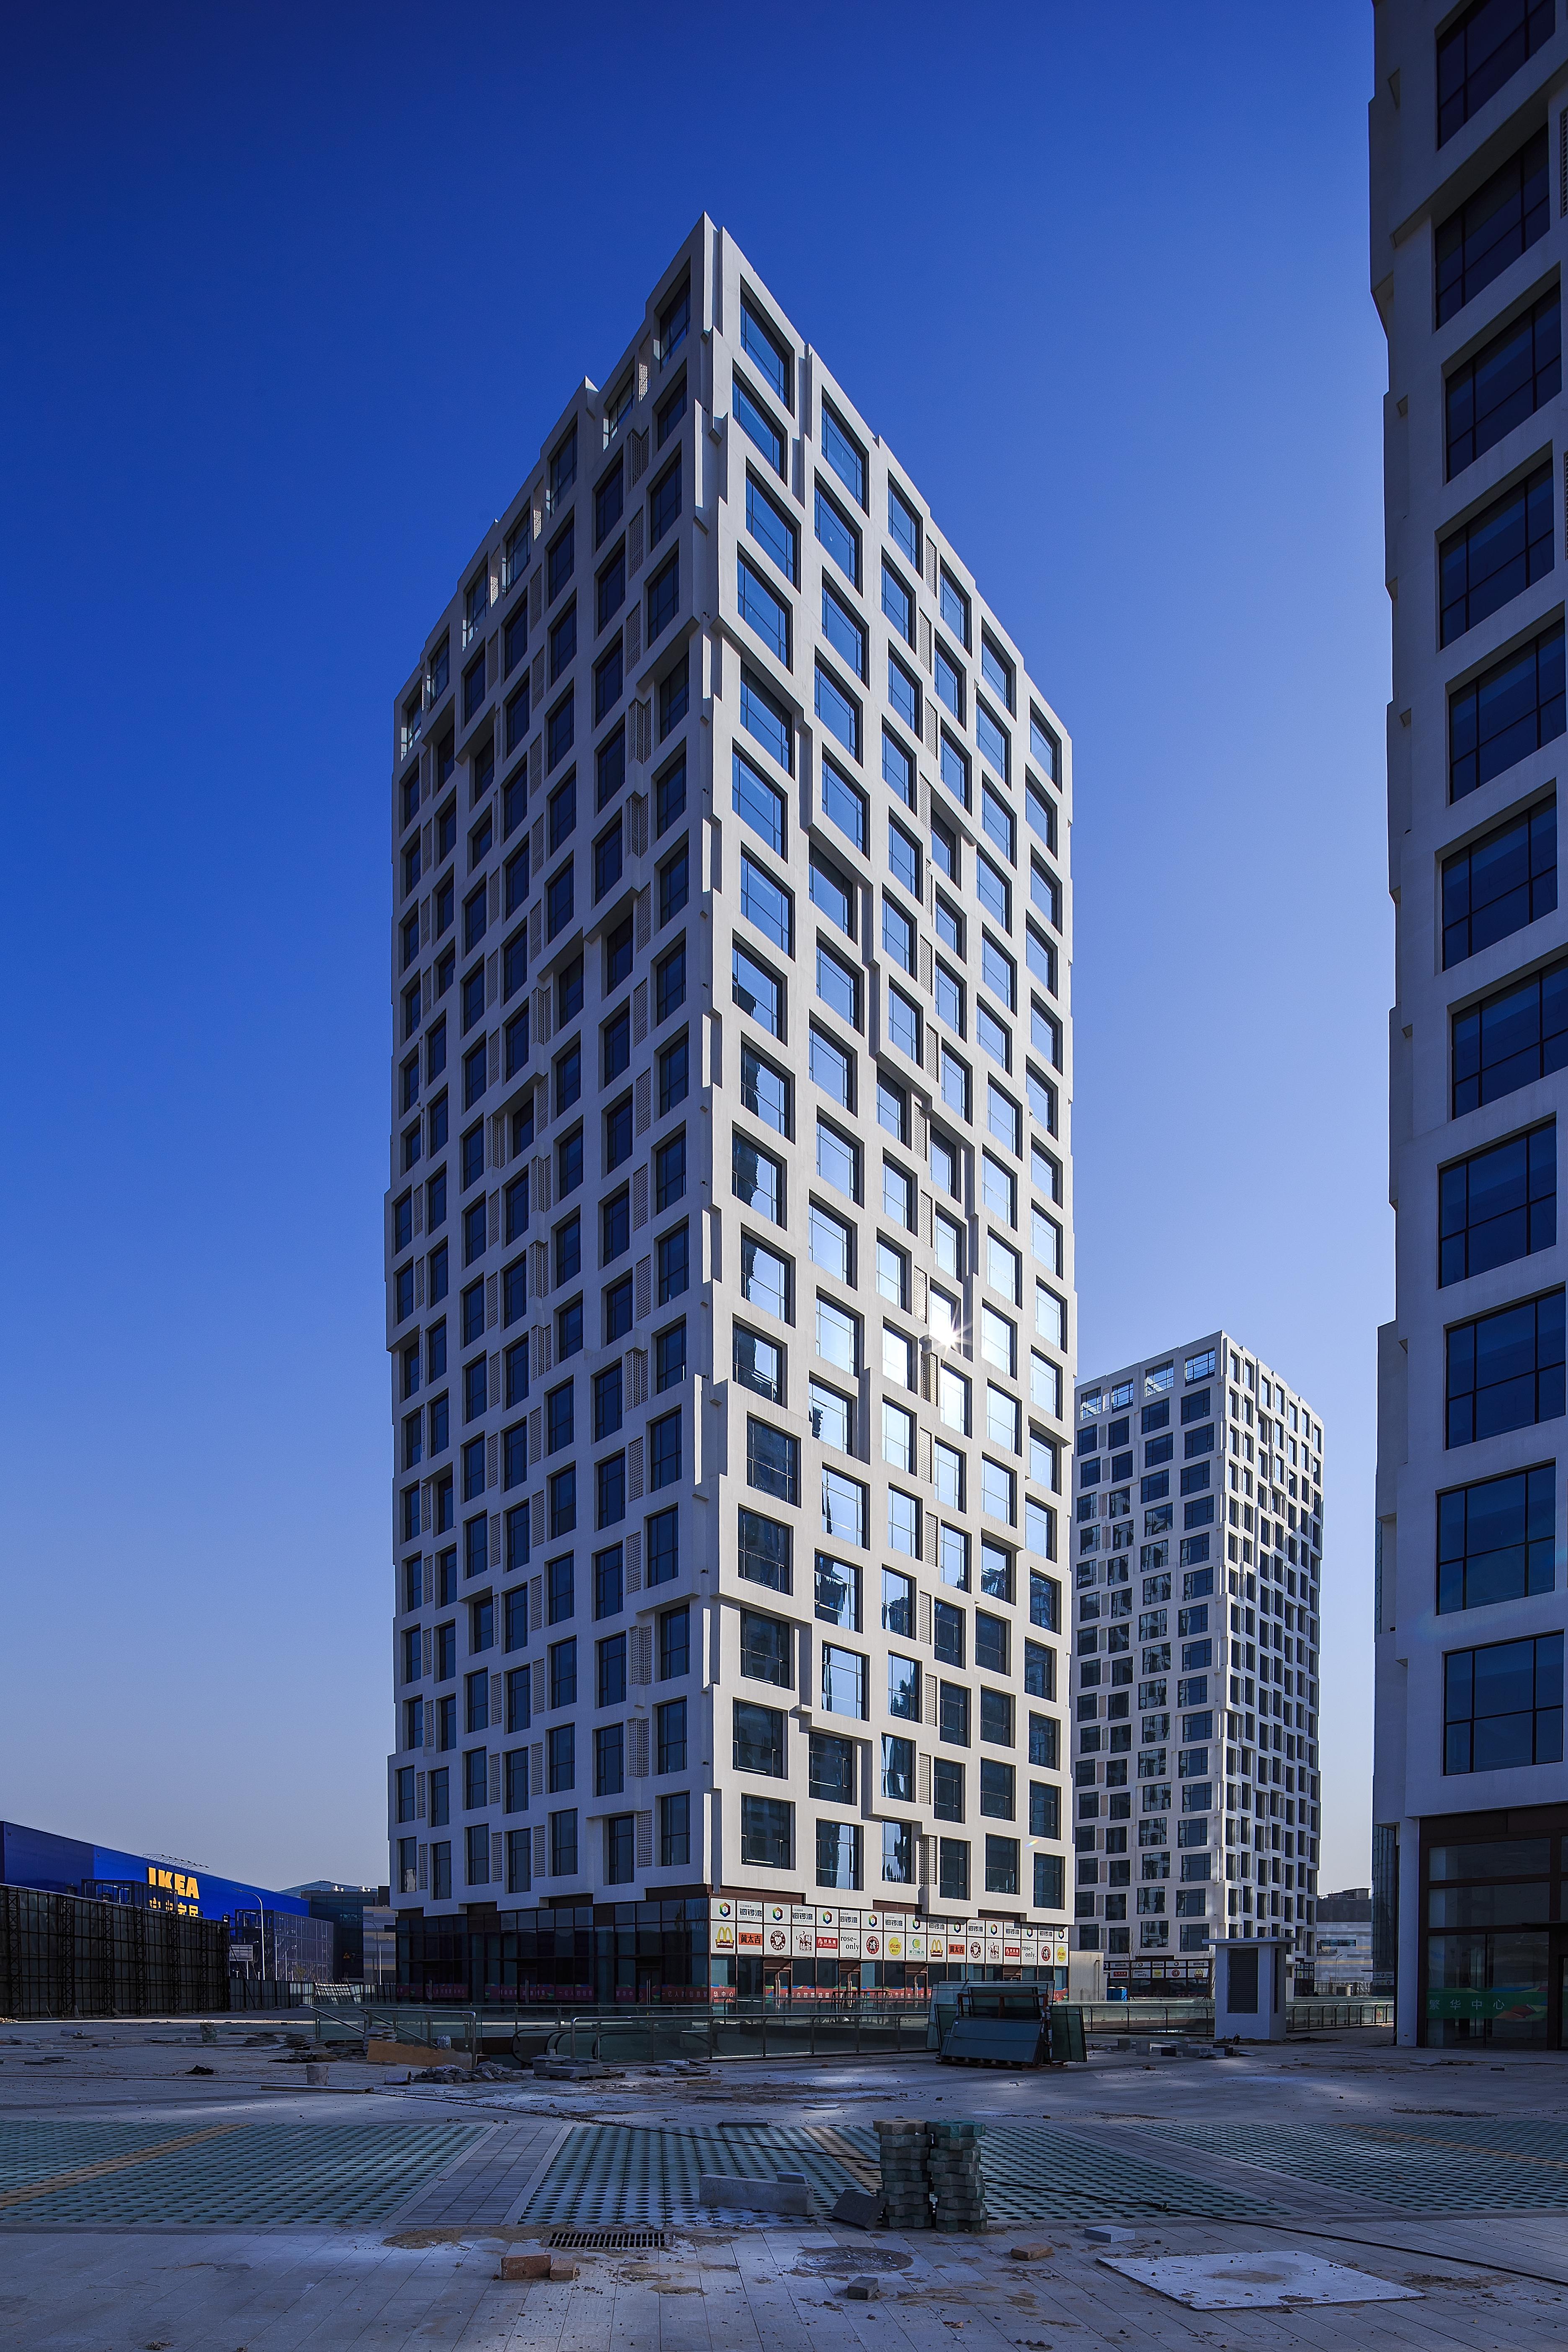 <p>CDD – Creative Design District, mix-use complex voor creative industry en lofts</p>